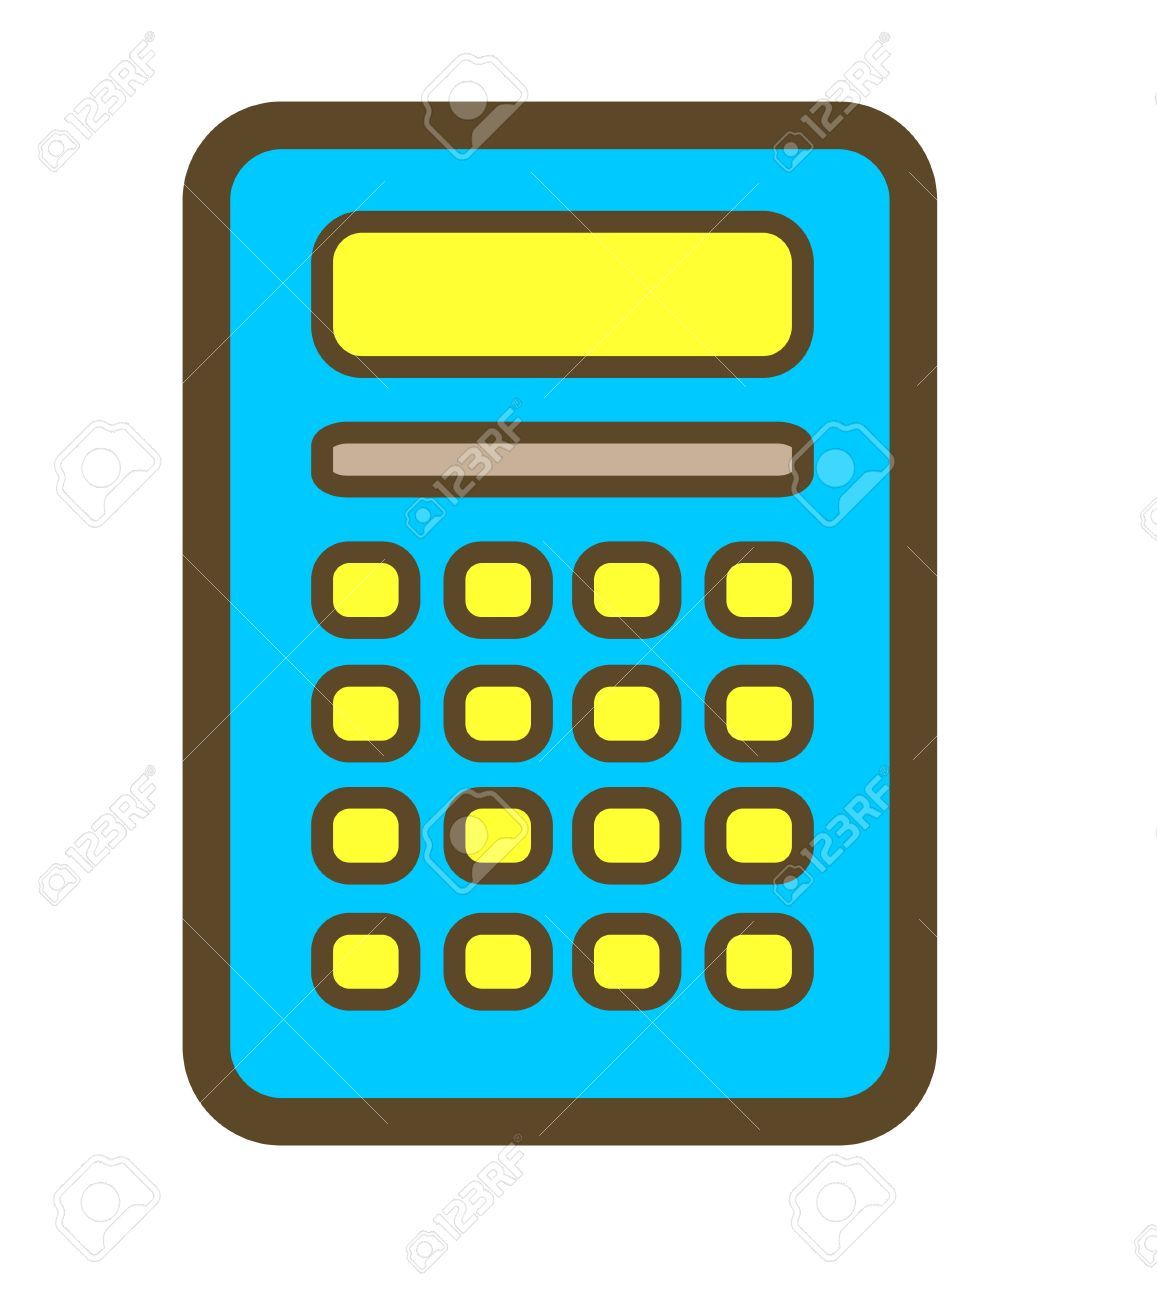 Calculadora clipart graphic transparent download Calculadora clipart 3 » Clipart Portal graphic transparent download